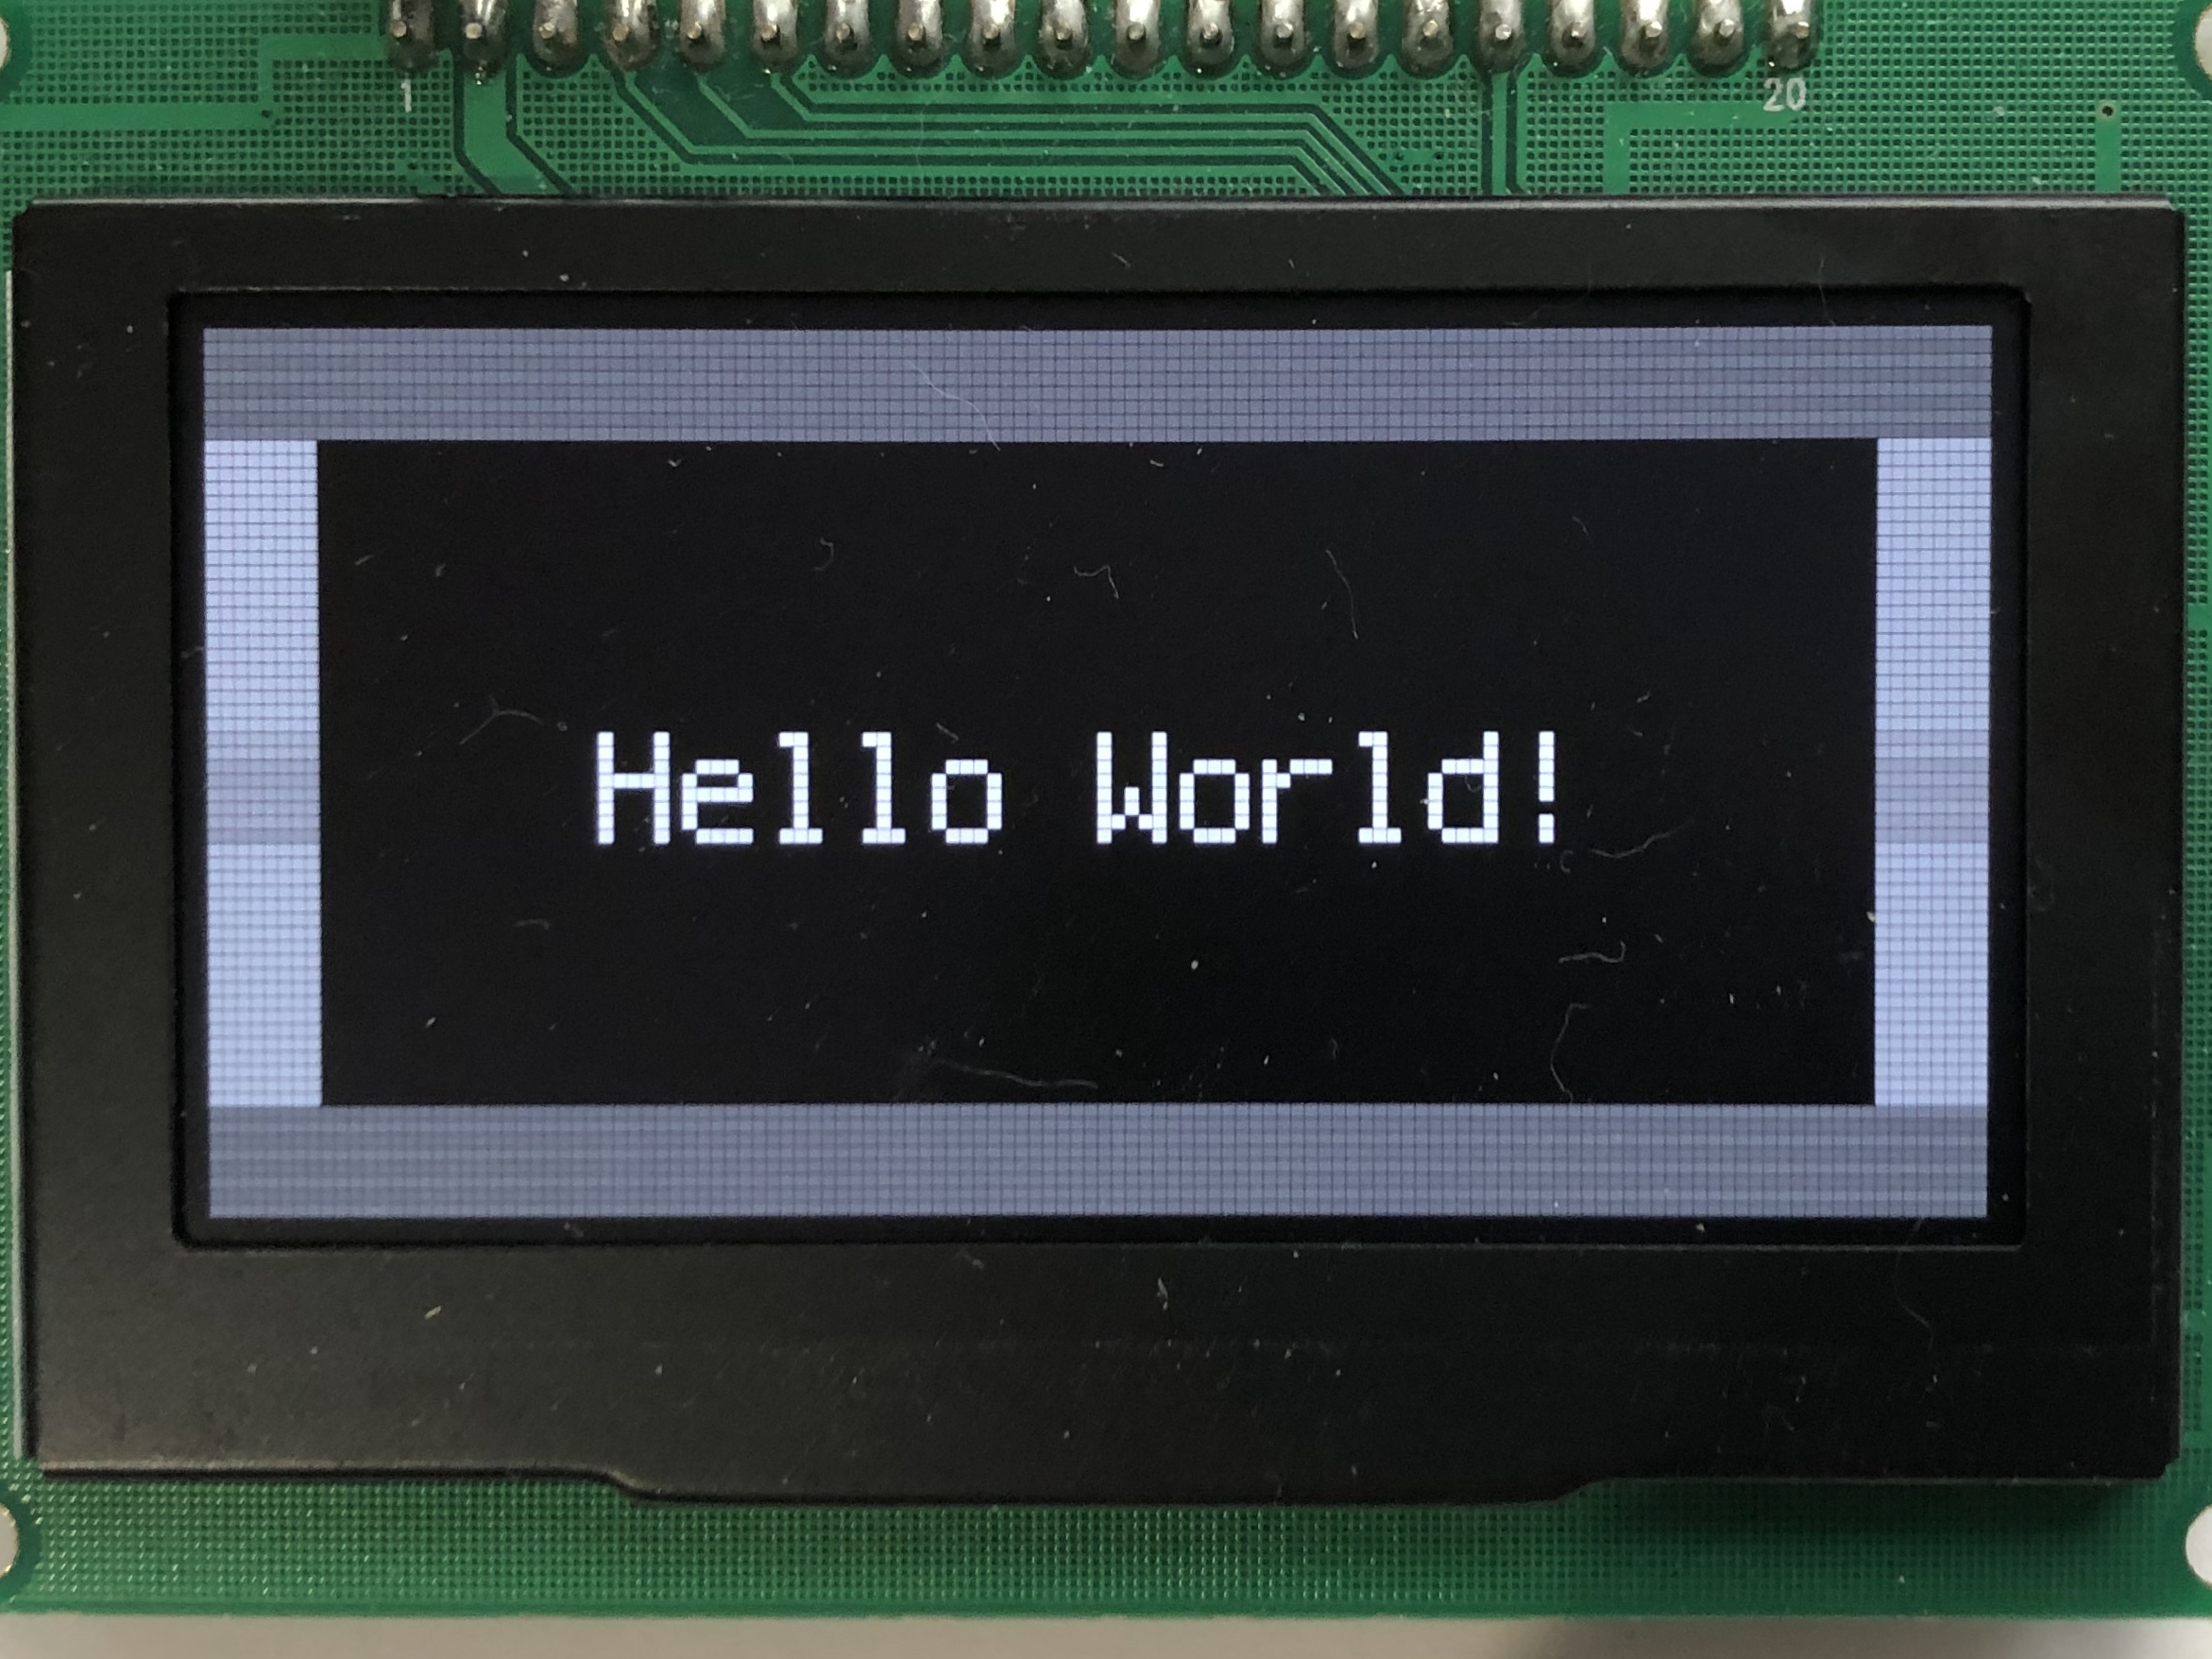 adafruit_products_hello-world.jpeg